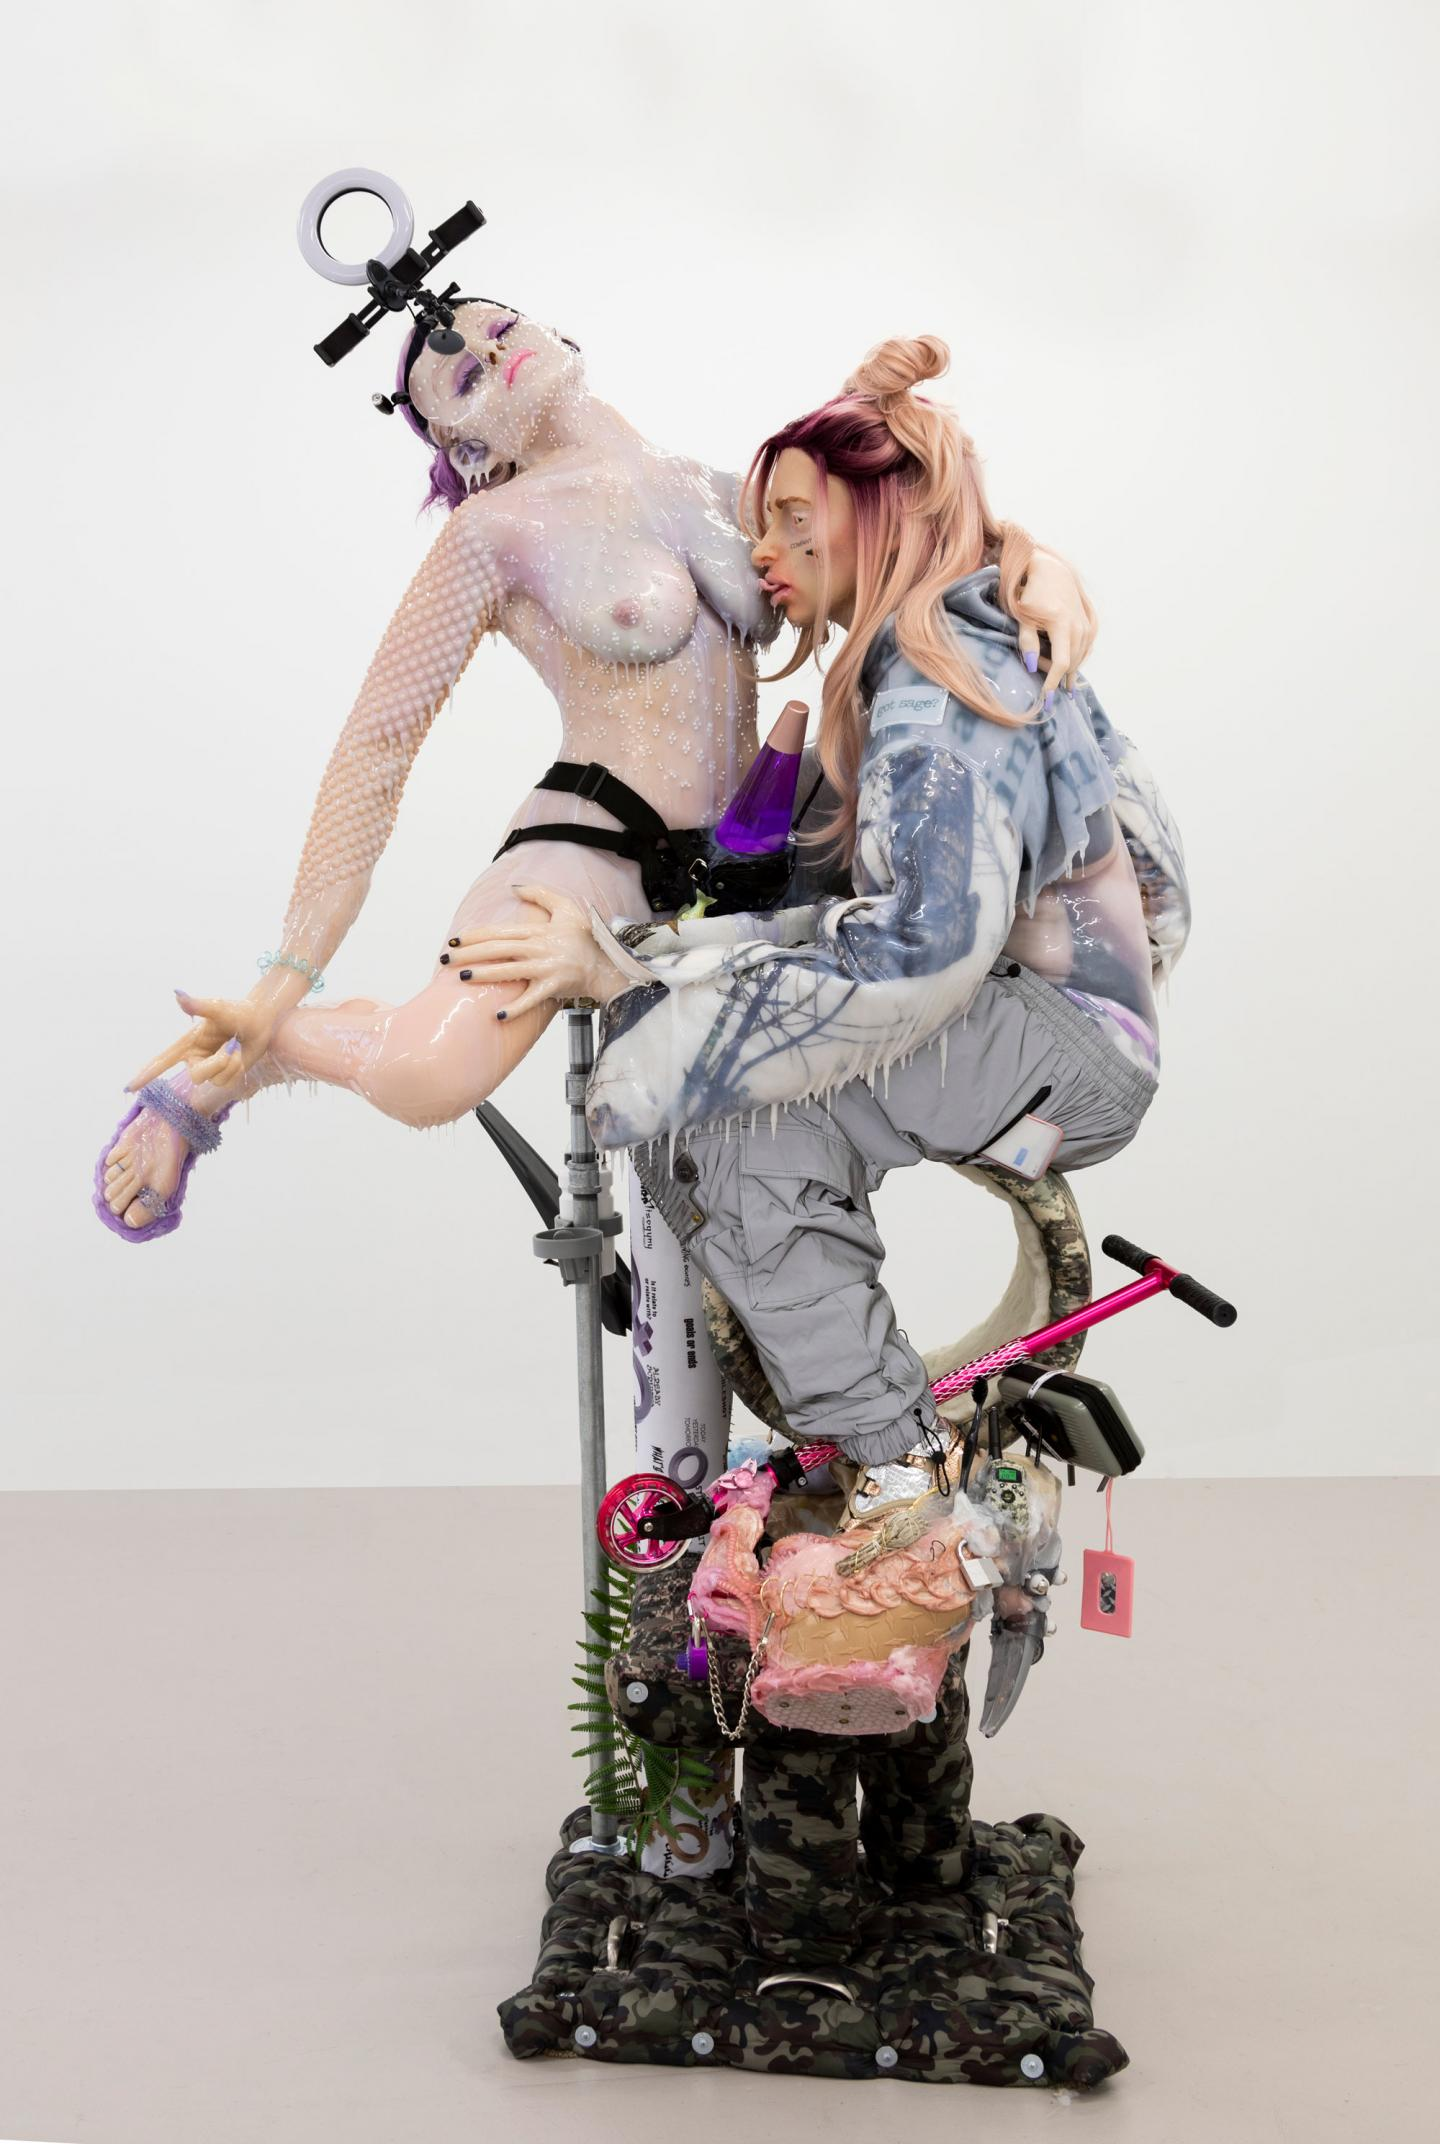 Cajsa von Zeipel, Aqua Aura, 2020, pigmented silicon, mixed media, dimensions variable. Courtesy: the artist and COMPANY Gallery, New York